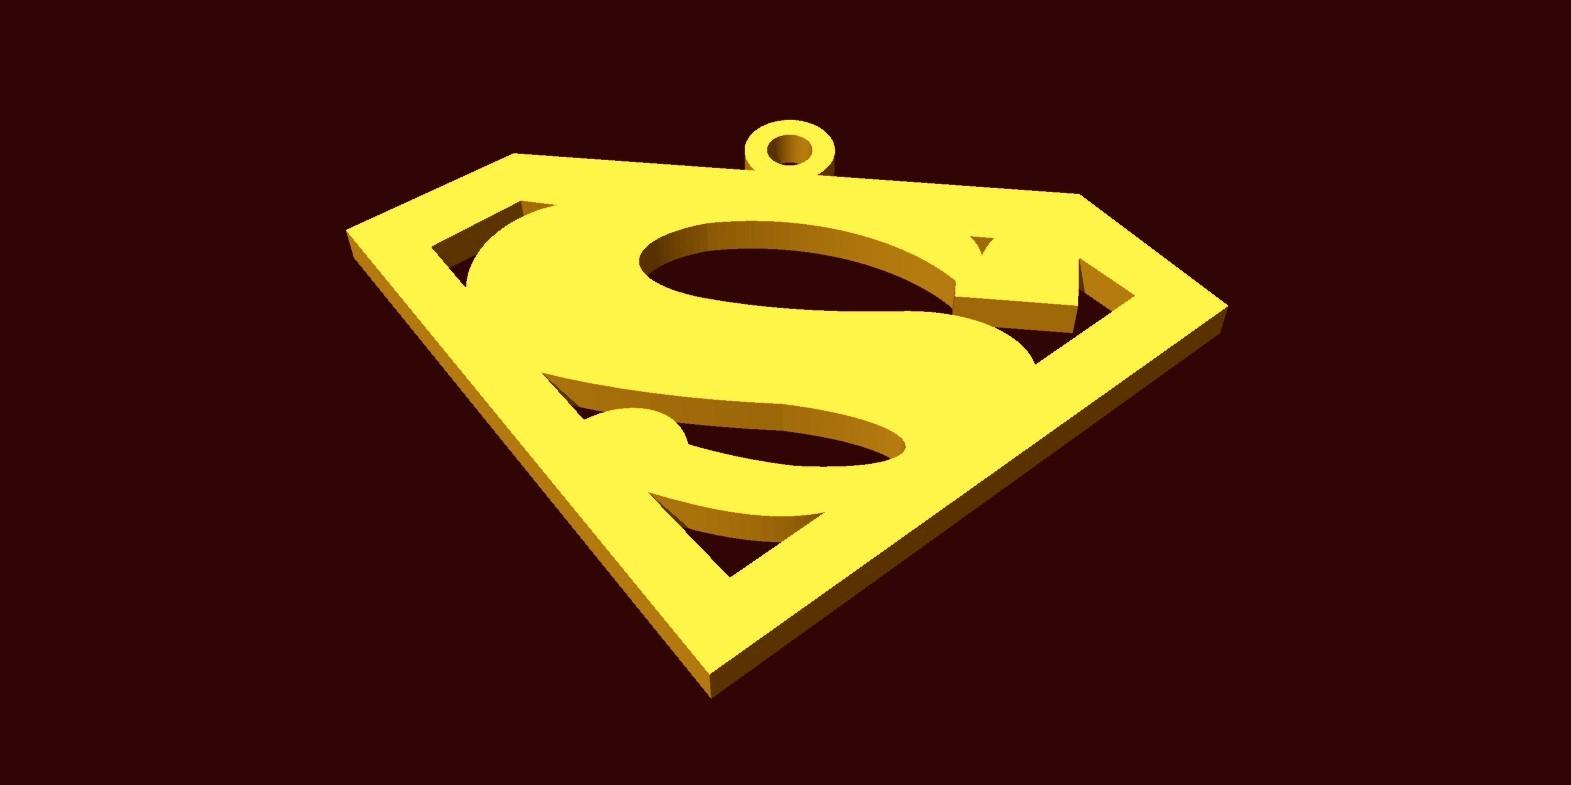 superman.jpg Download free STL file superman pendant • 3D printable template, fcosaldana0210